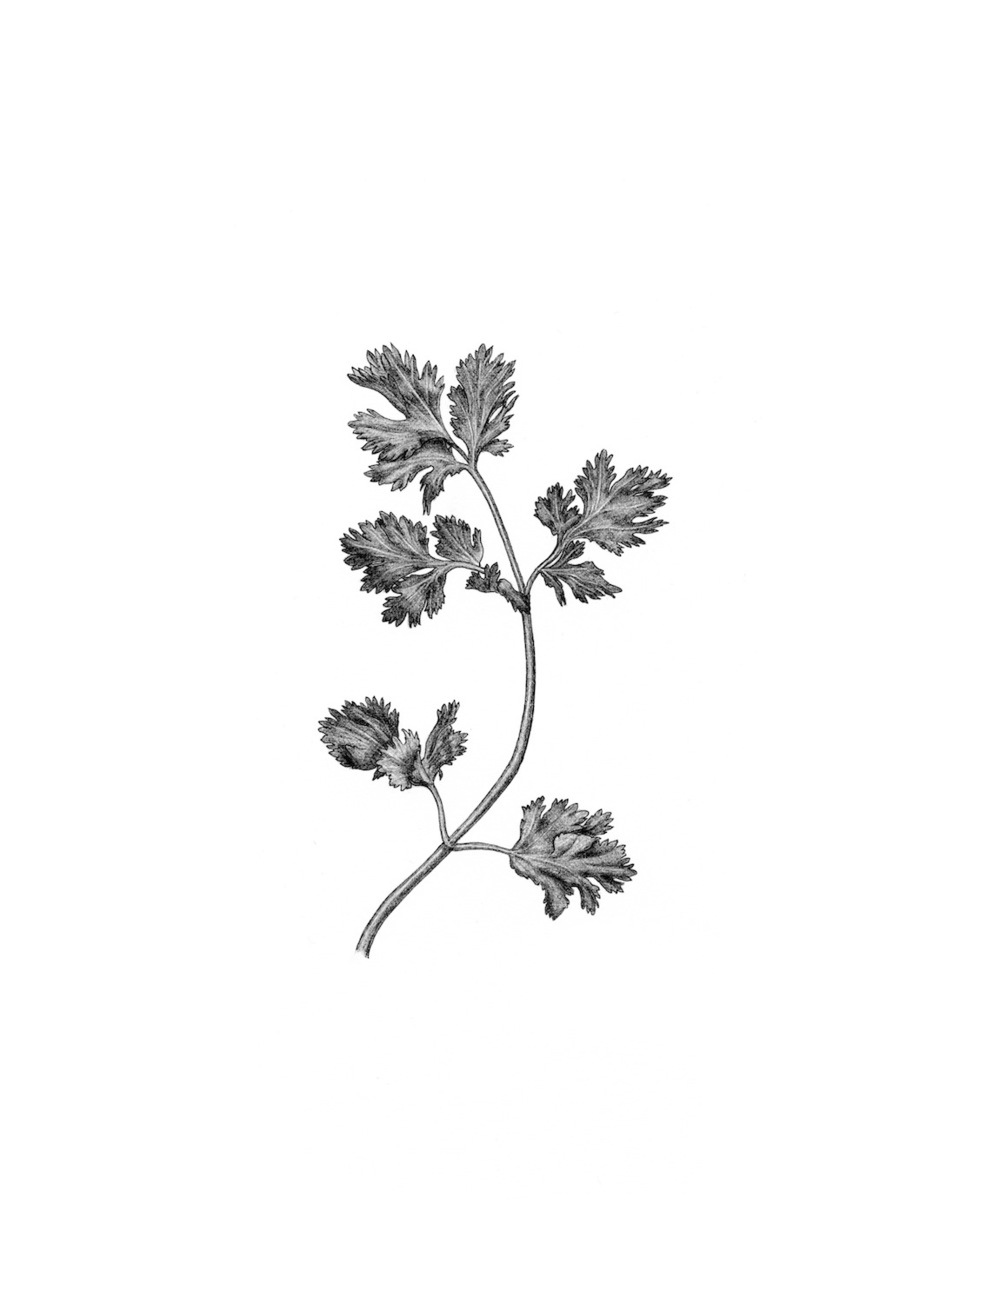 ss.cilantro.jpg